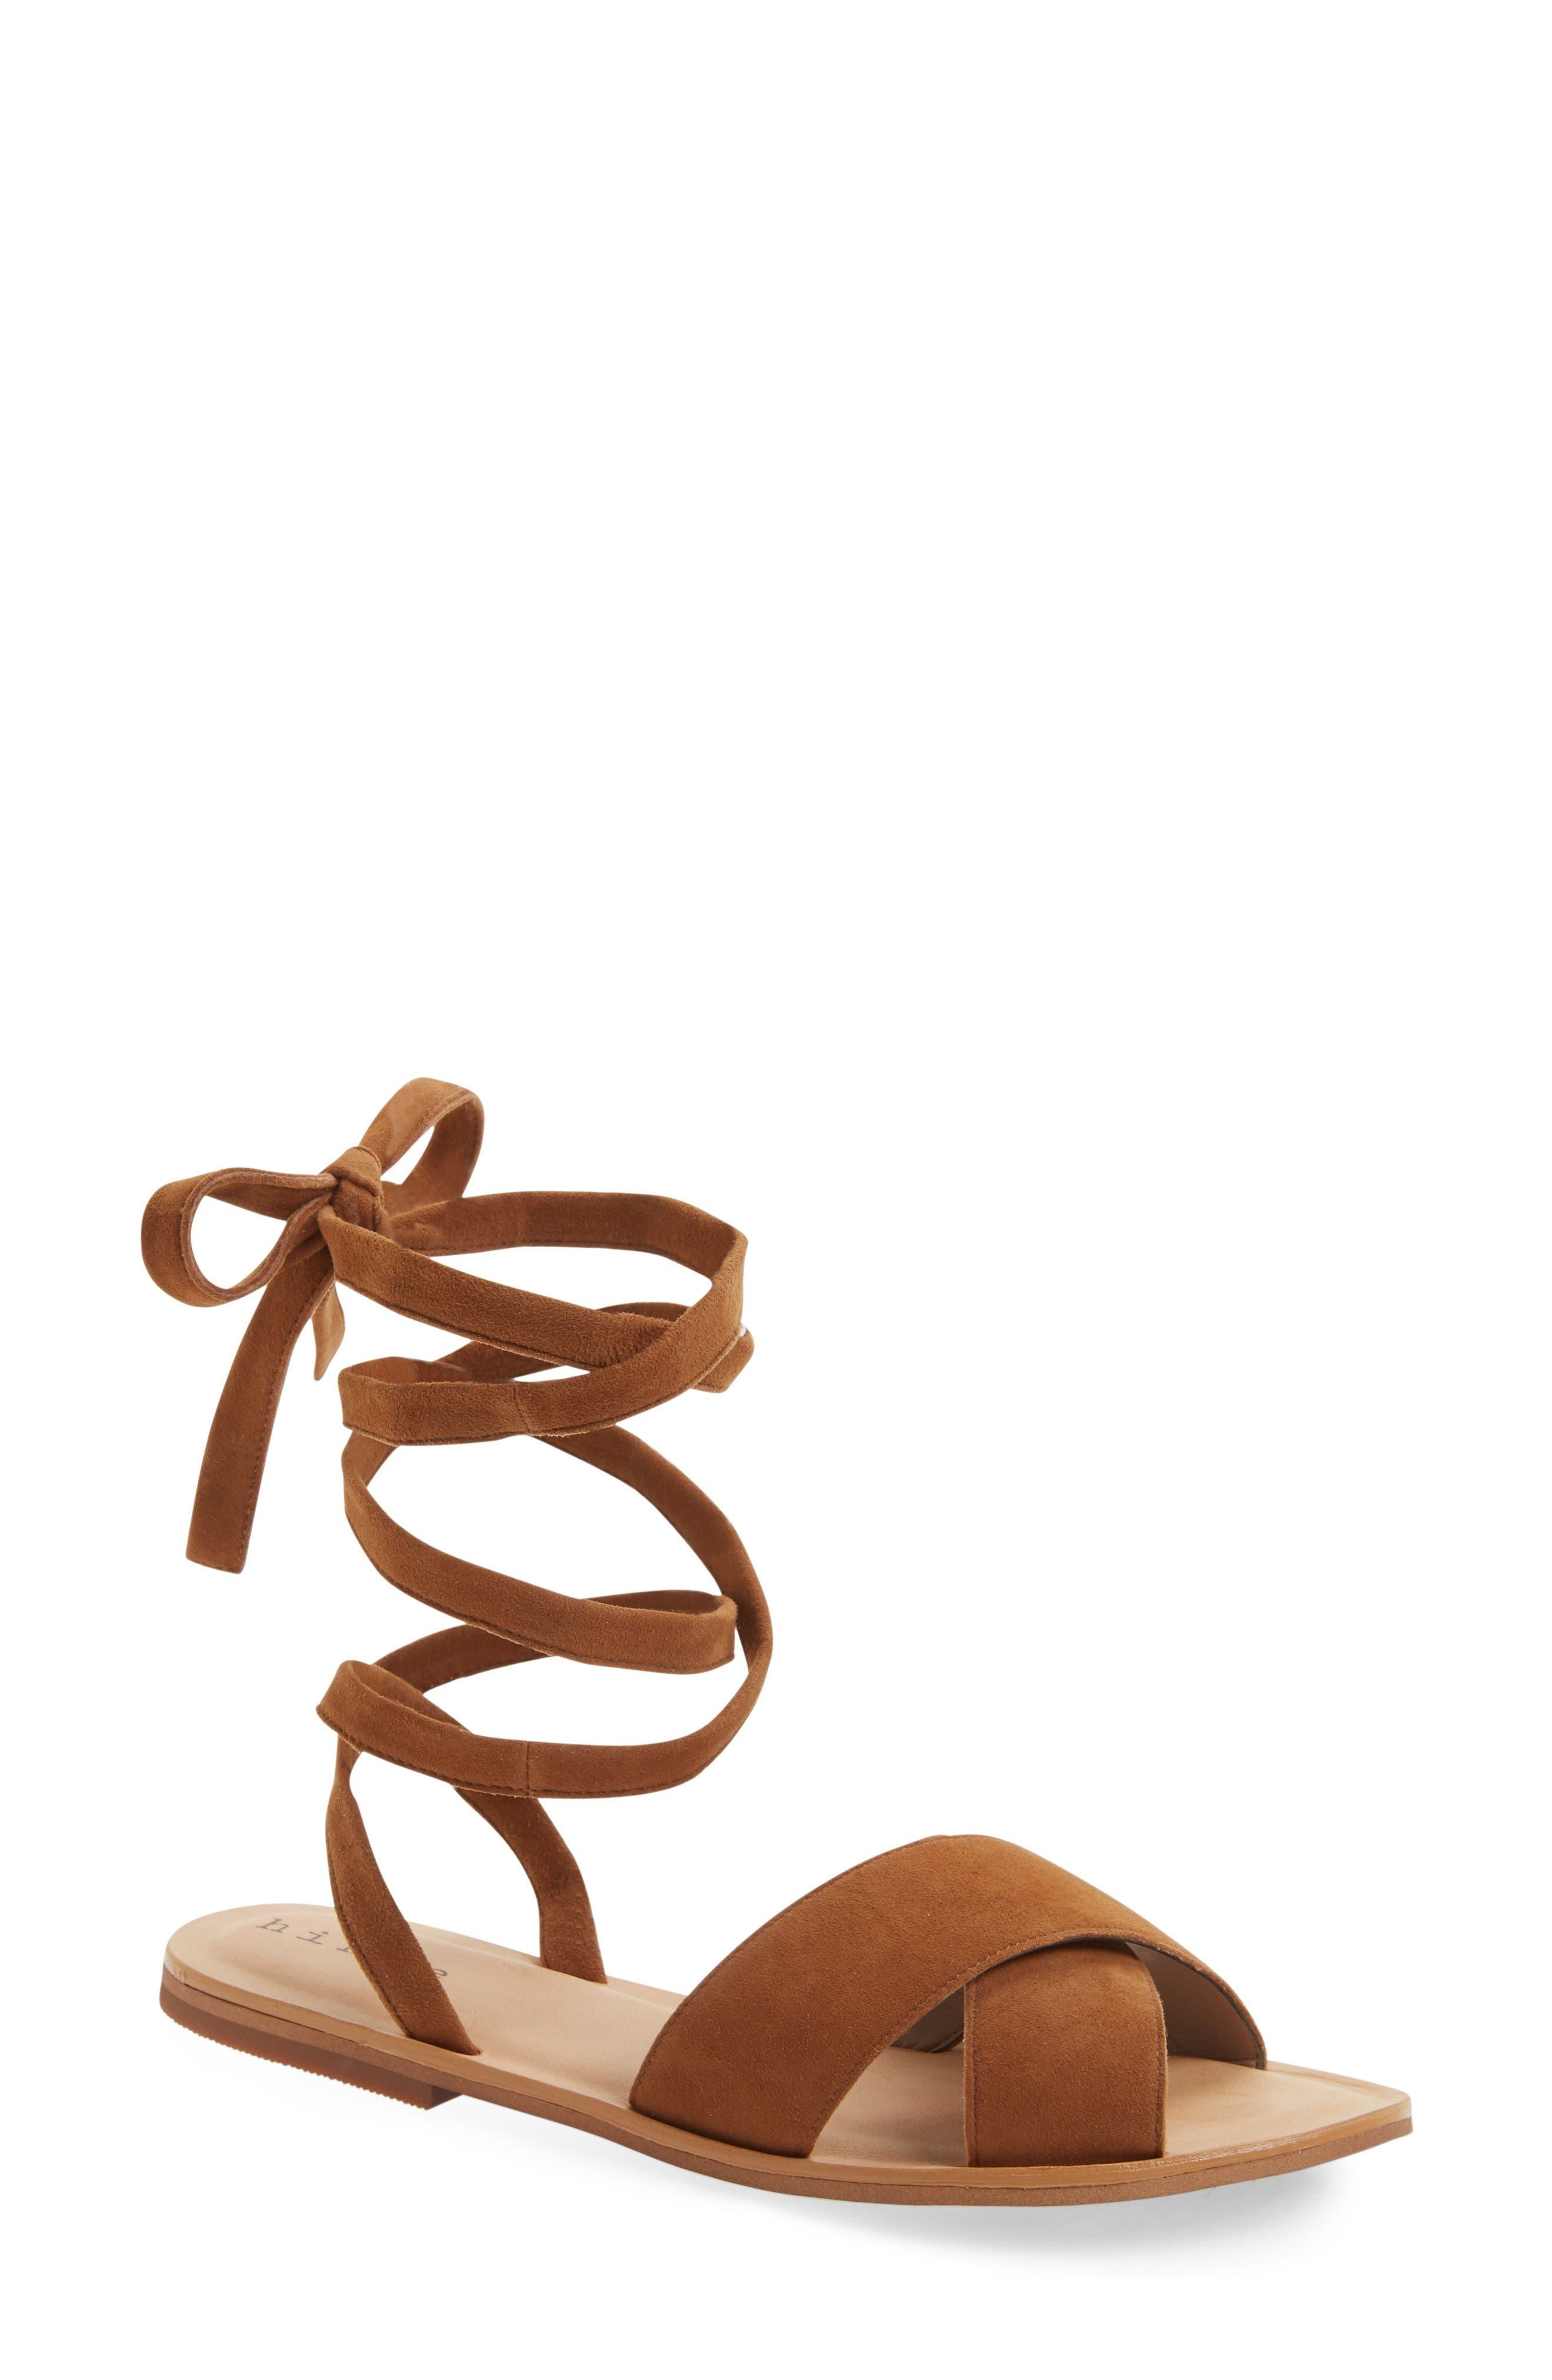 Olivia Sandal,                         Main,                         color, Brown Suede